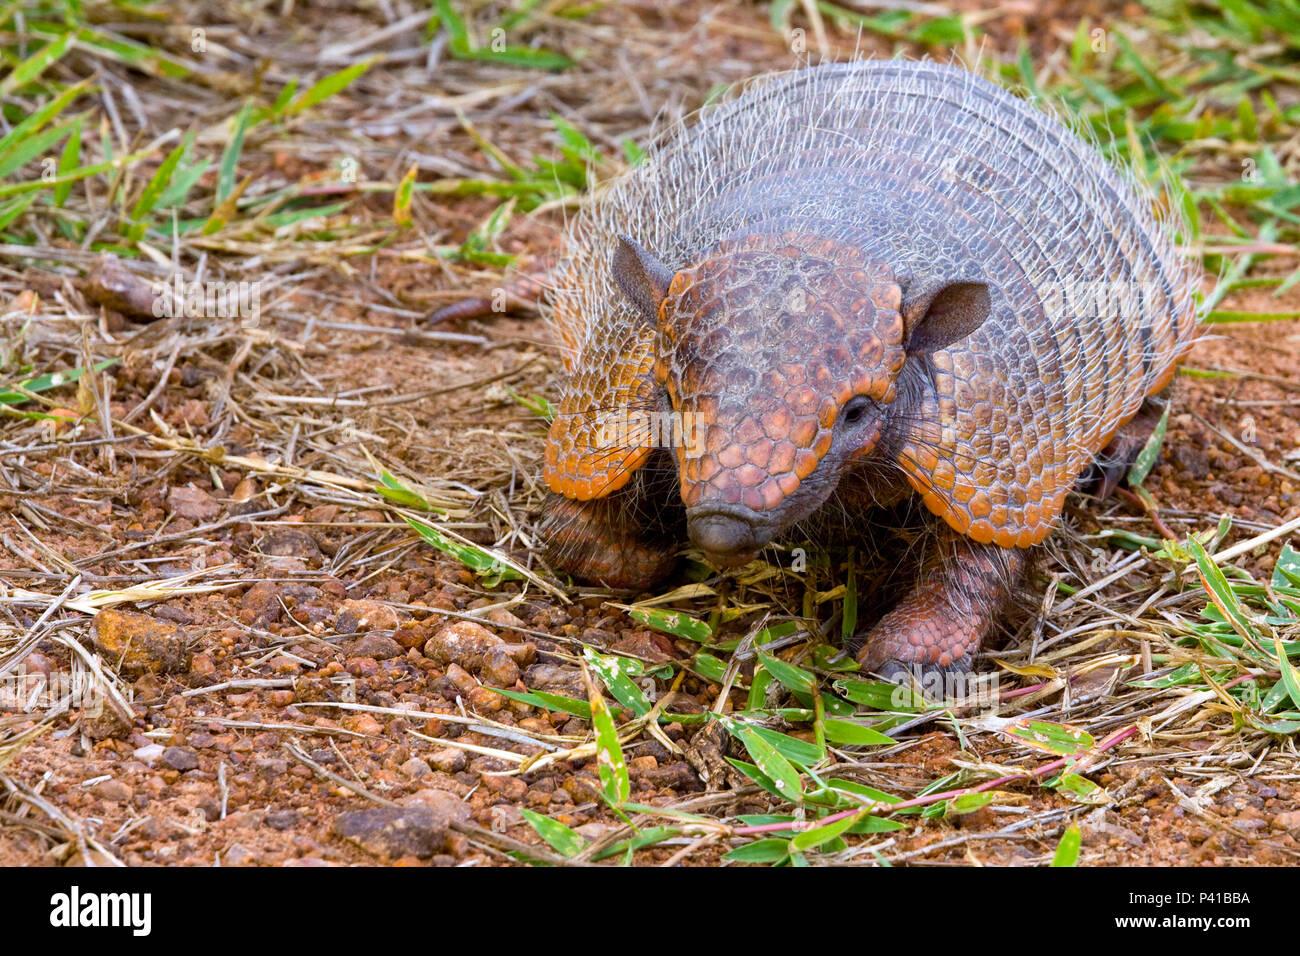 Tatupeba; tatu-Euphractus sexcinctus peludo;;; fauna animal; Natureza; Pantanal; Aquidauana; Mato Grosso do Sul, Brasil Imagen De Stock